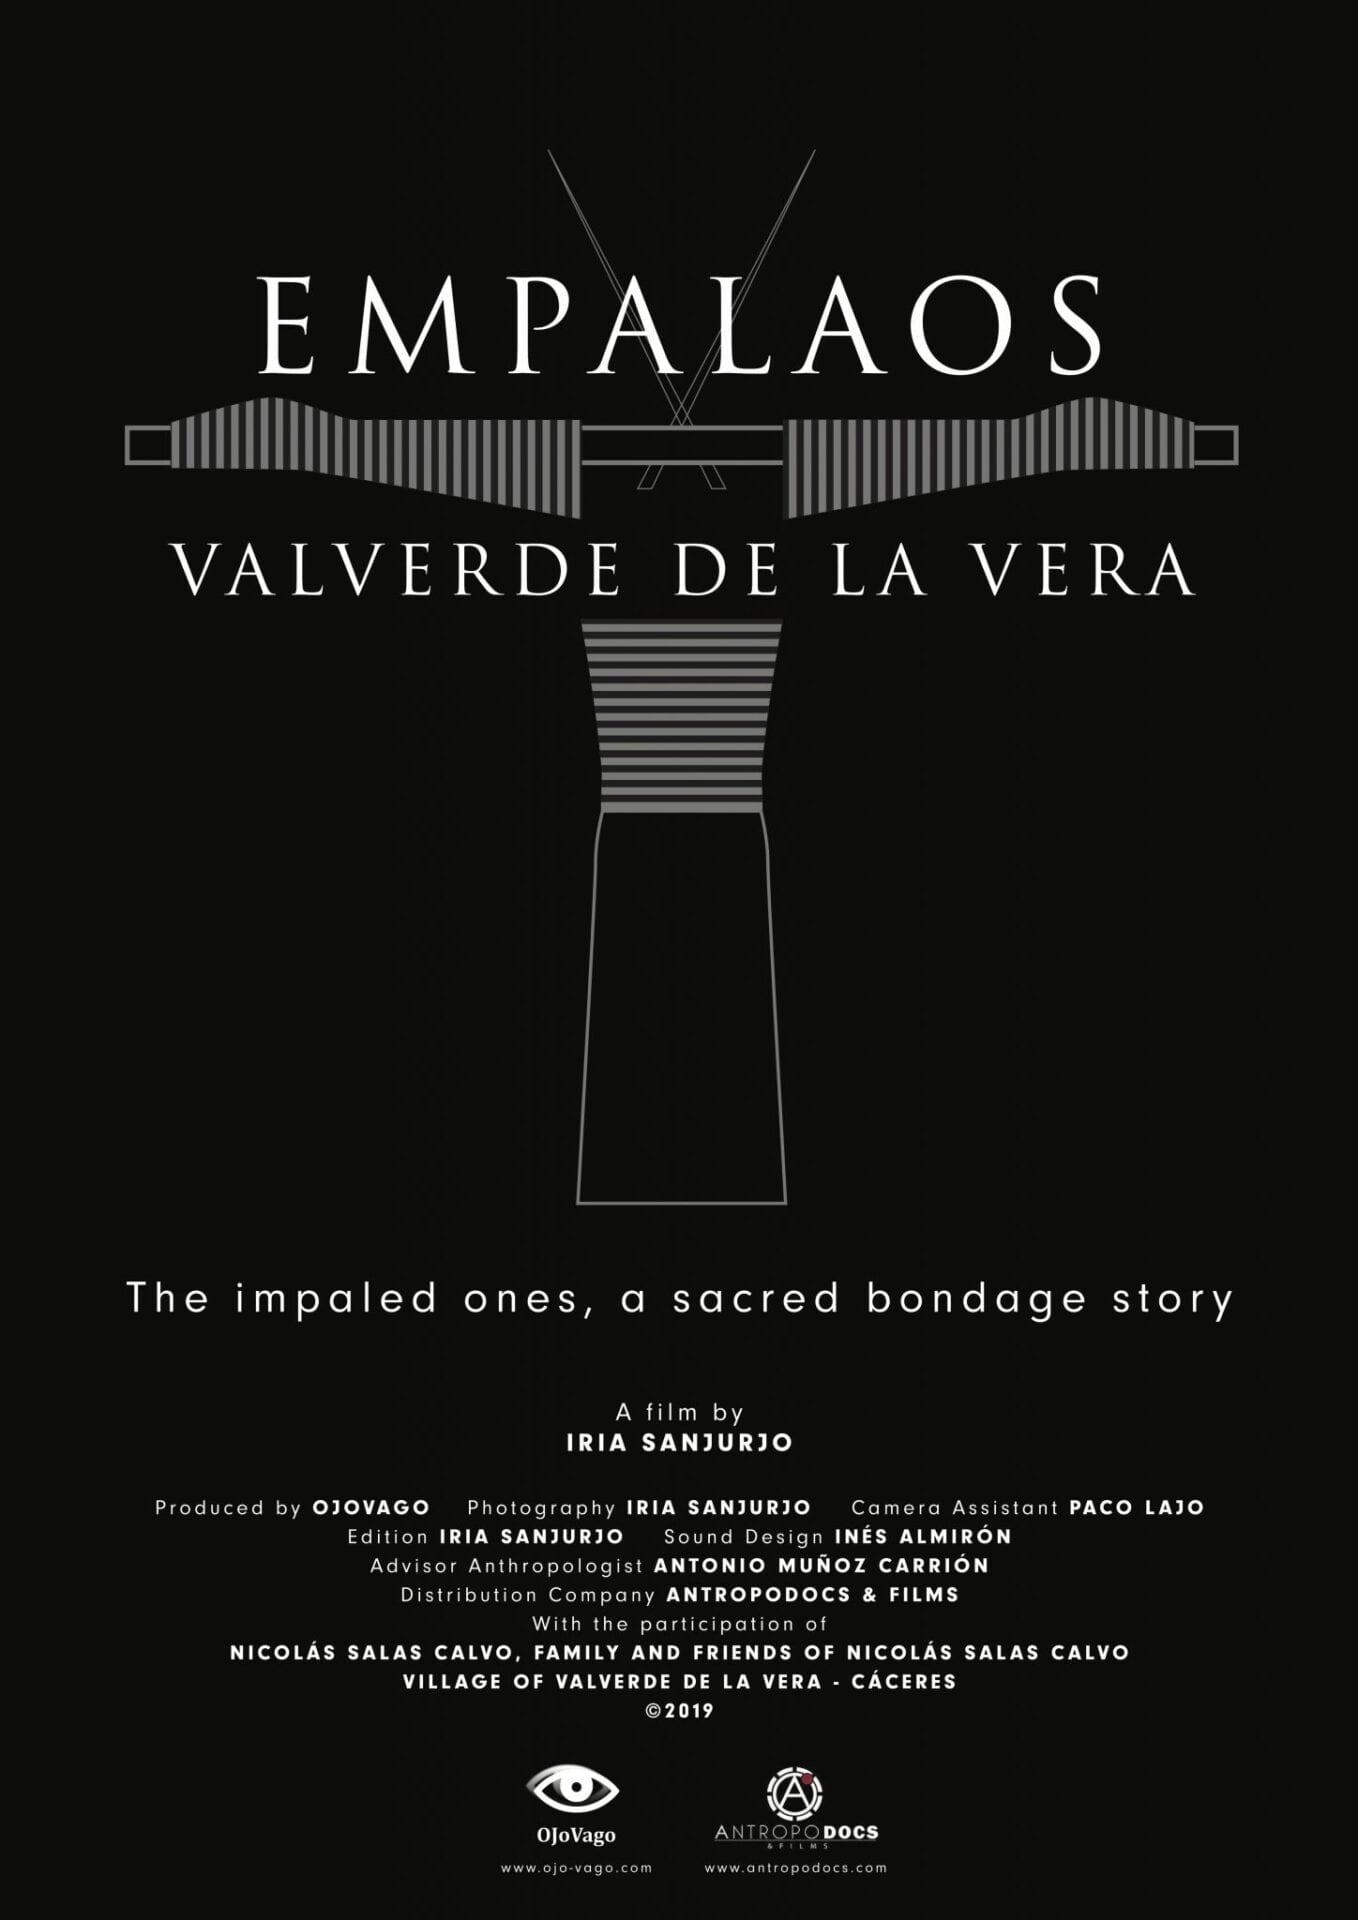 Empalaos – A sacred bondage story